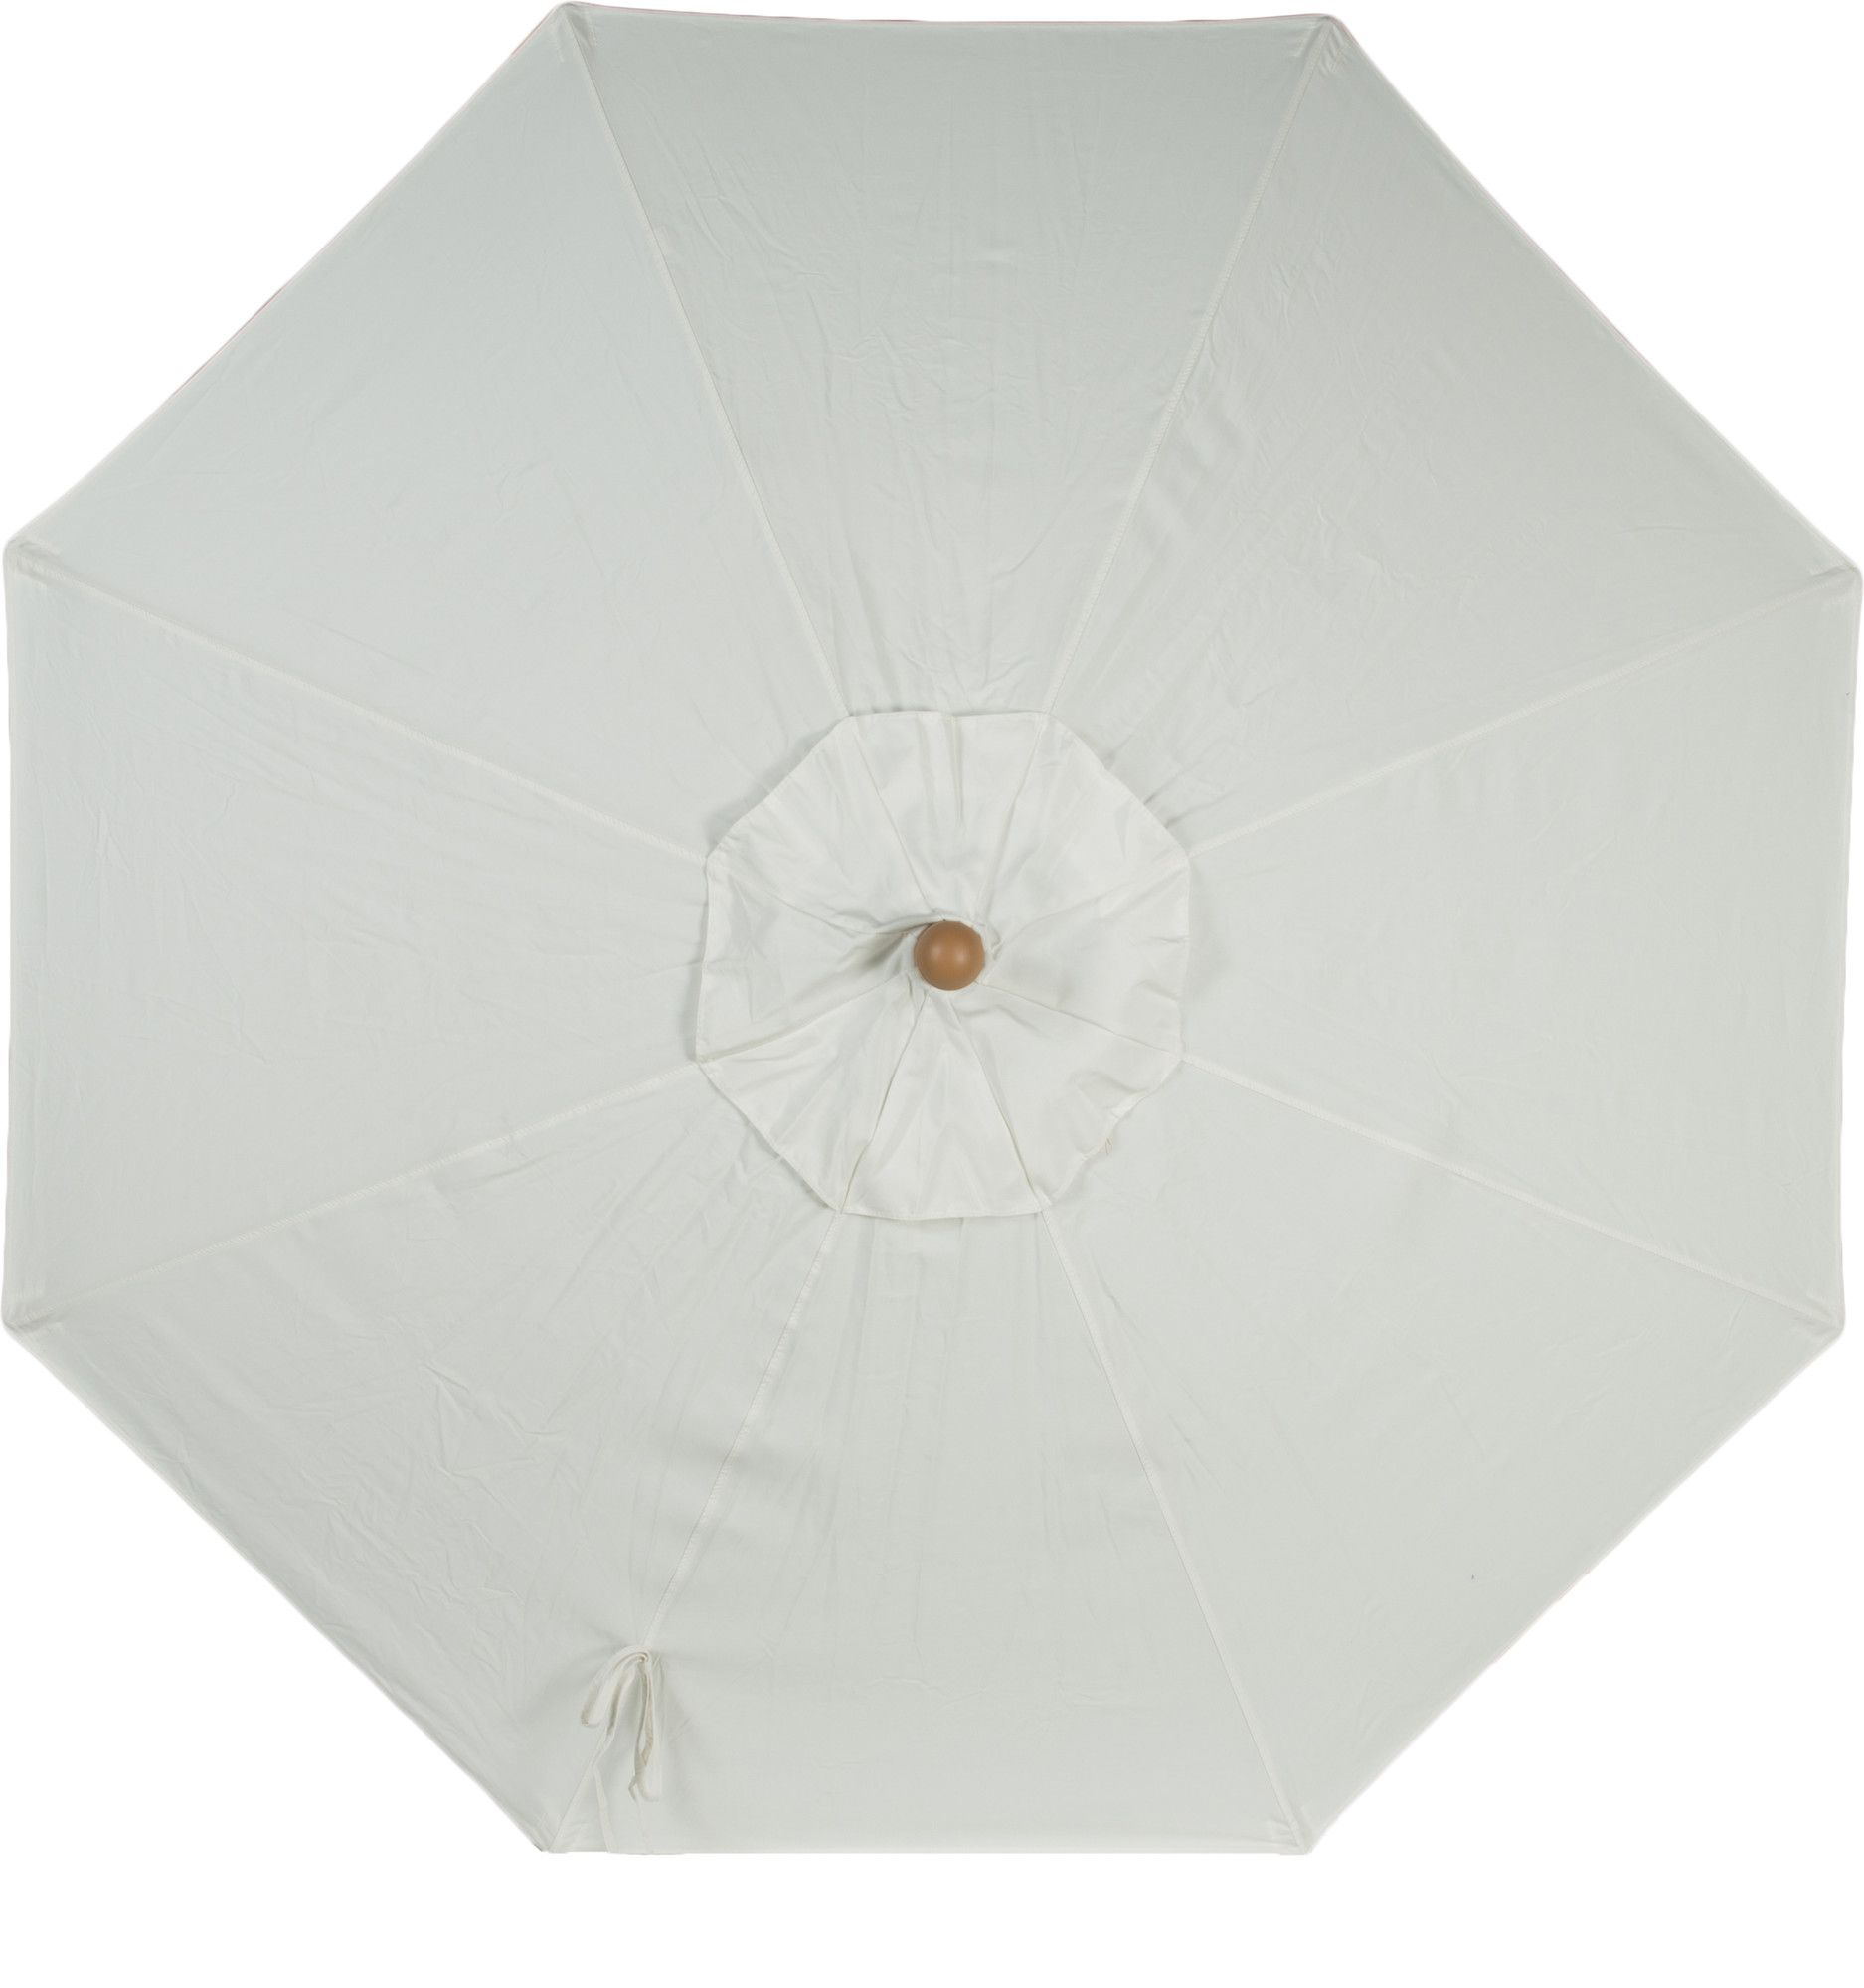 9u0027 Sunbrella Replacement Canopy for Market Umbrella  sc 1 st  Pinterest & Amauri Outdoor Living Inc 9u0027 Sunbrella Replacement Canopy for ...